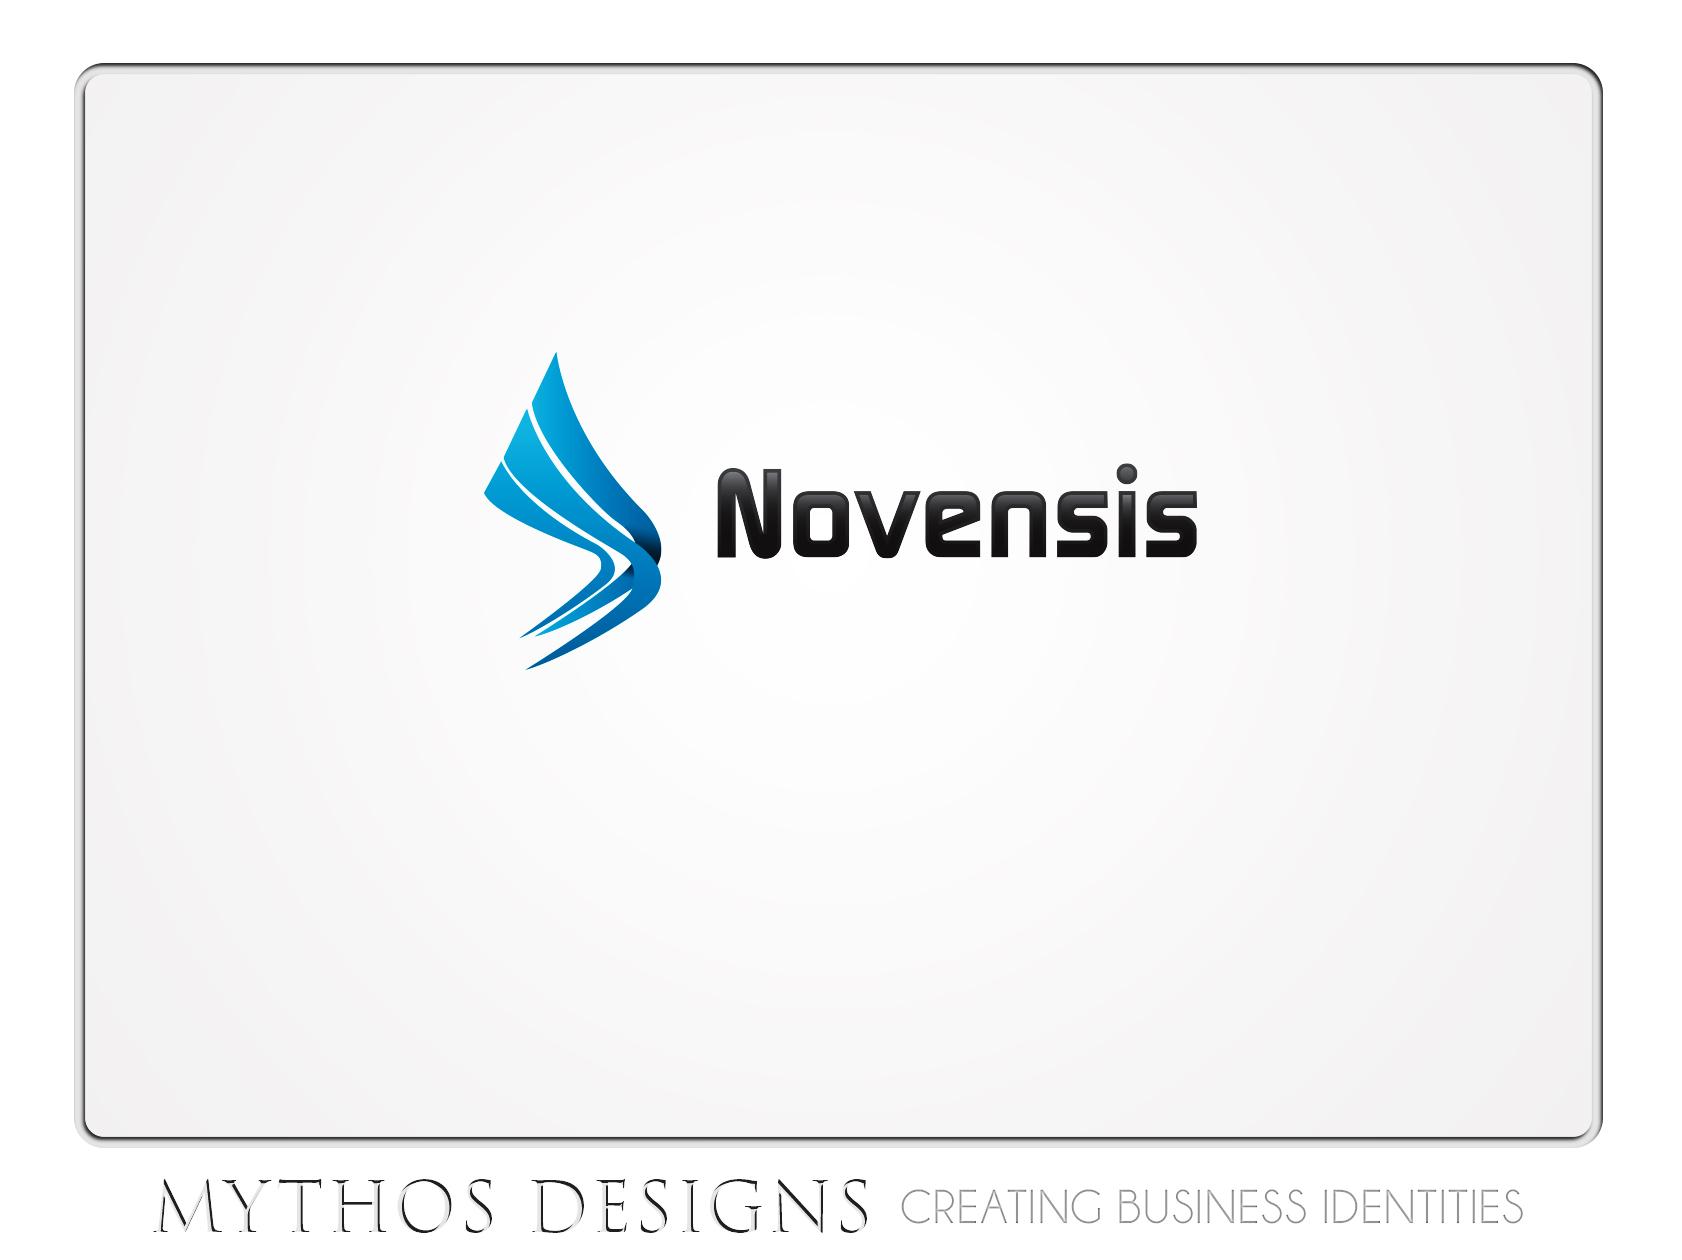 Logo Design by Mythos Designs - Entry No. 51 in the Logo Design Contest Novensis Logo Design.